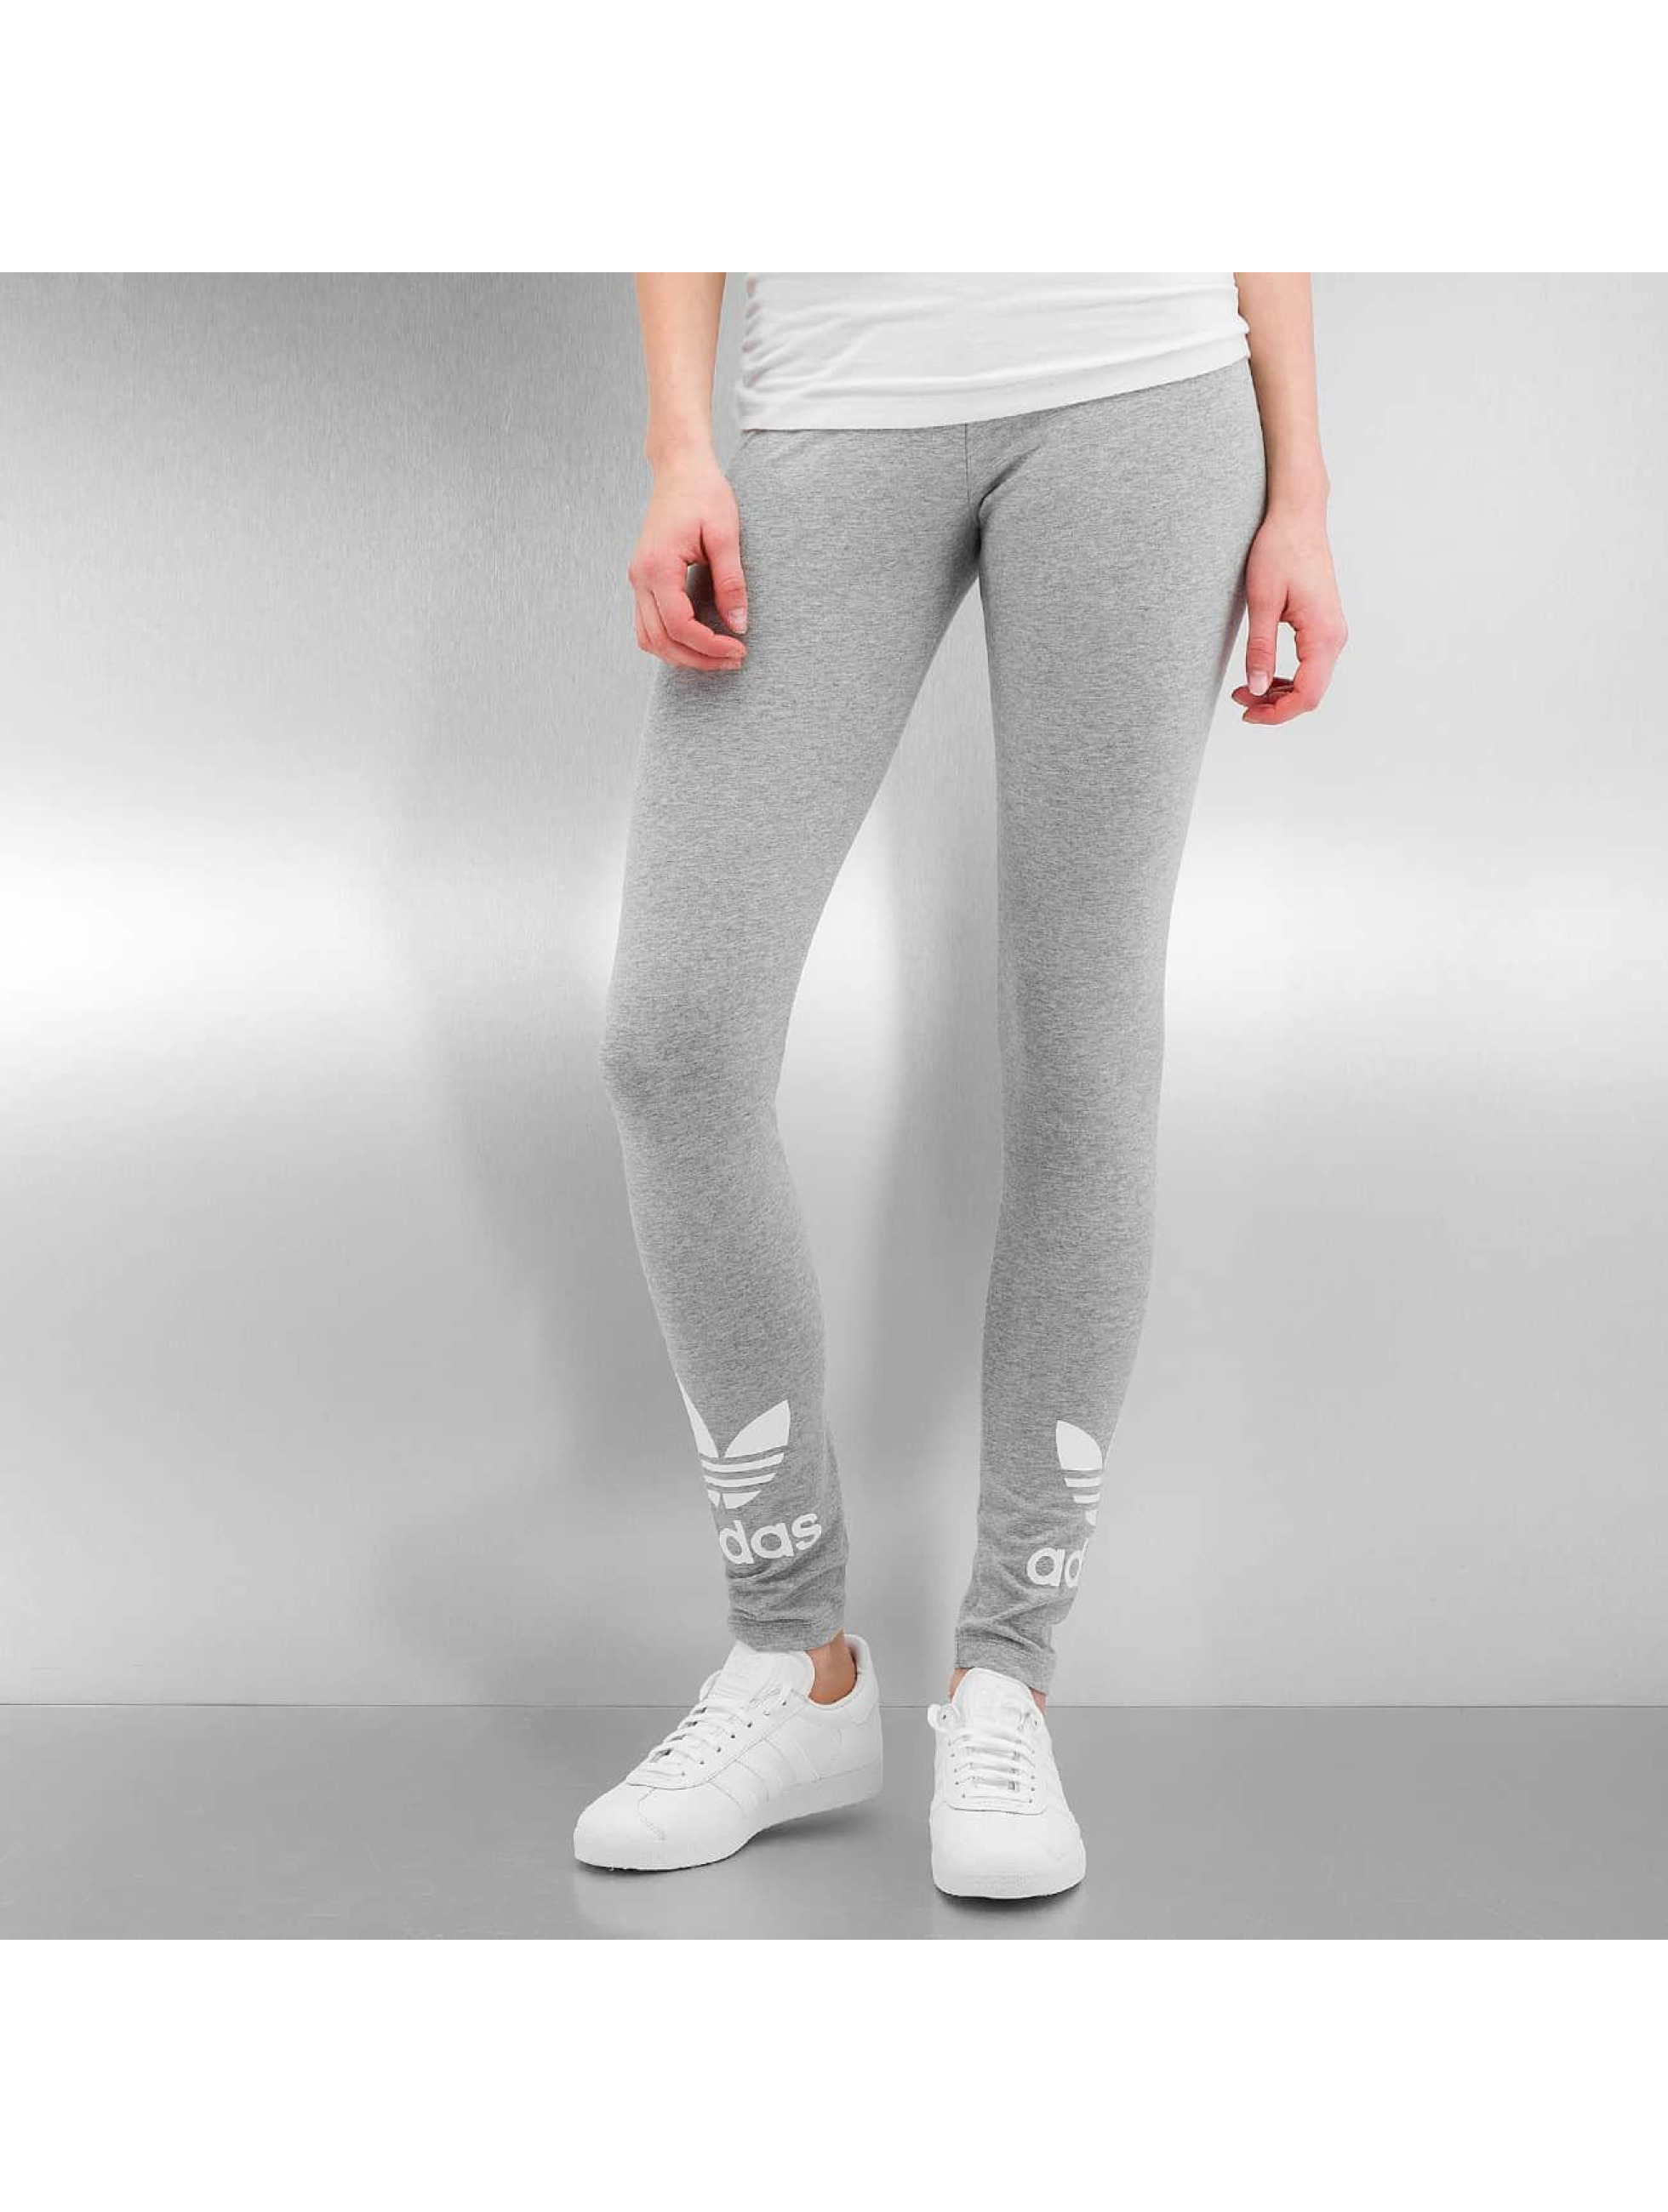 adidas pantalon leggings trefoil en gris 302621. Black Bedroom Furniture Sets. Home Design Ideas